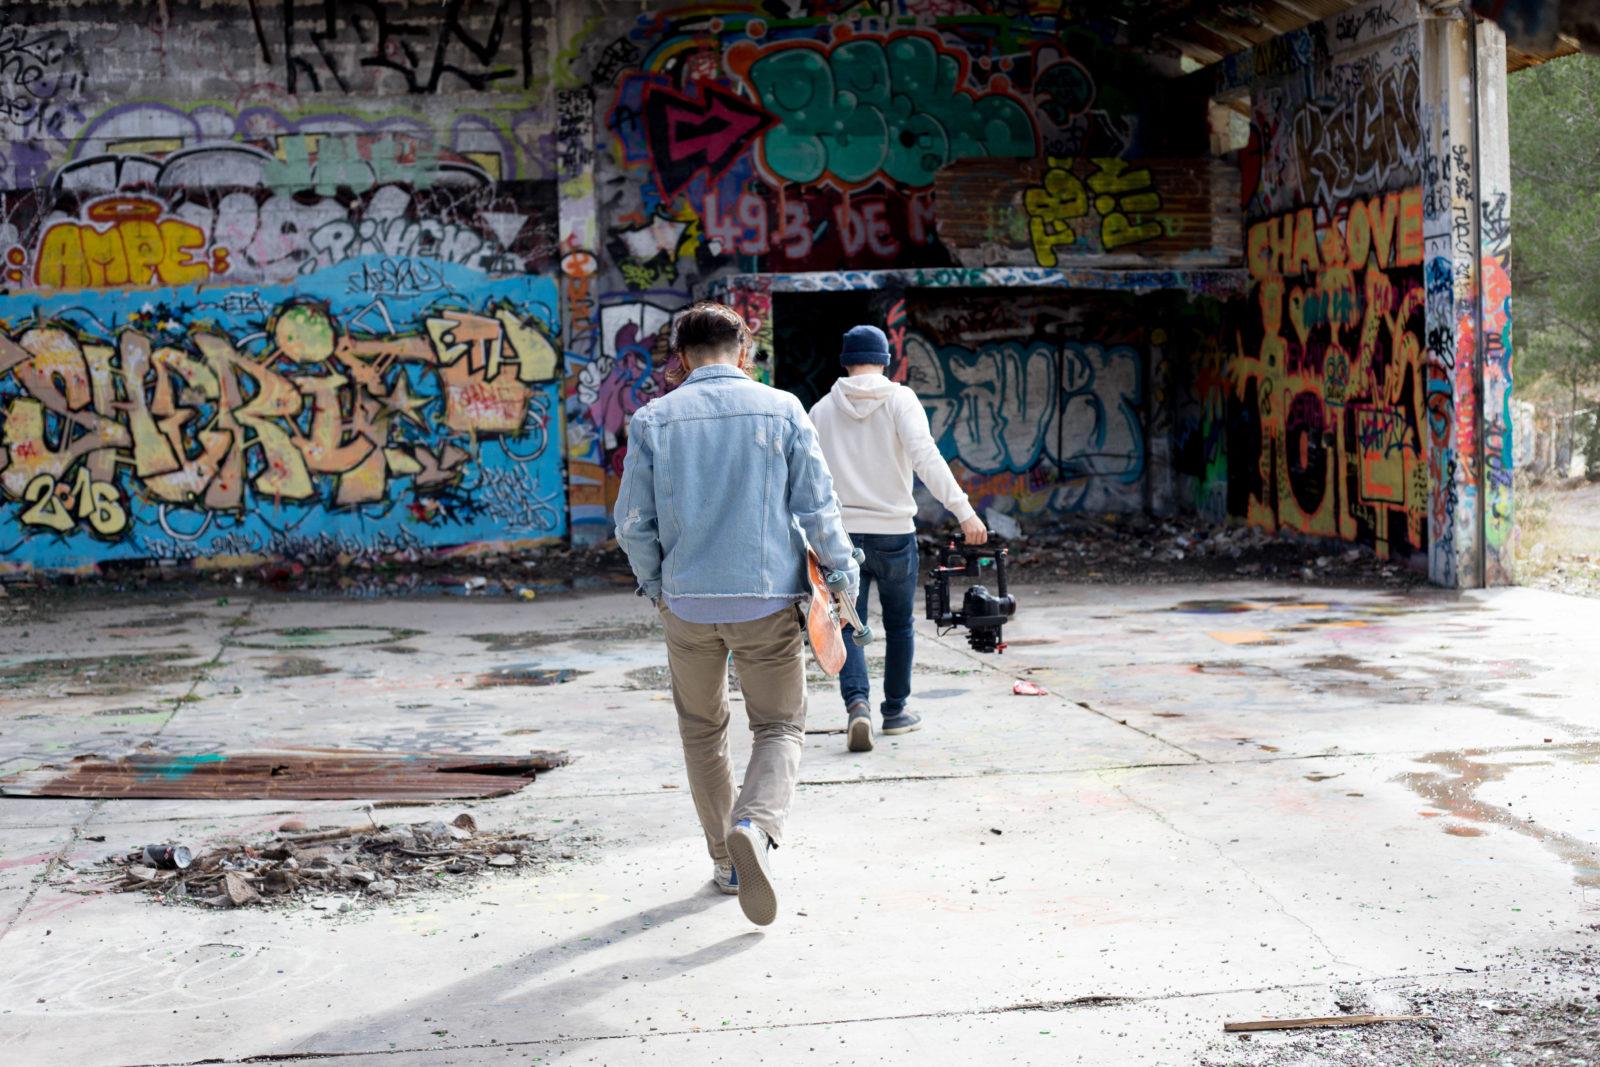 urbex jeanpantaleo skate Marseille LaCaverne tags graffitiIMG7128 - Des tricks et du freestyle avec Jean Pantaleo dans un skatepark 100% DIY